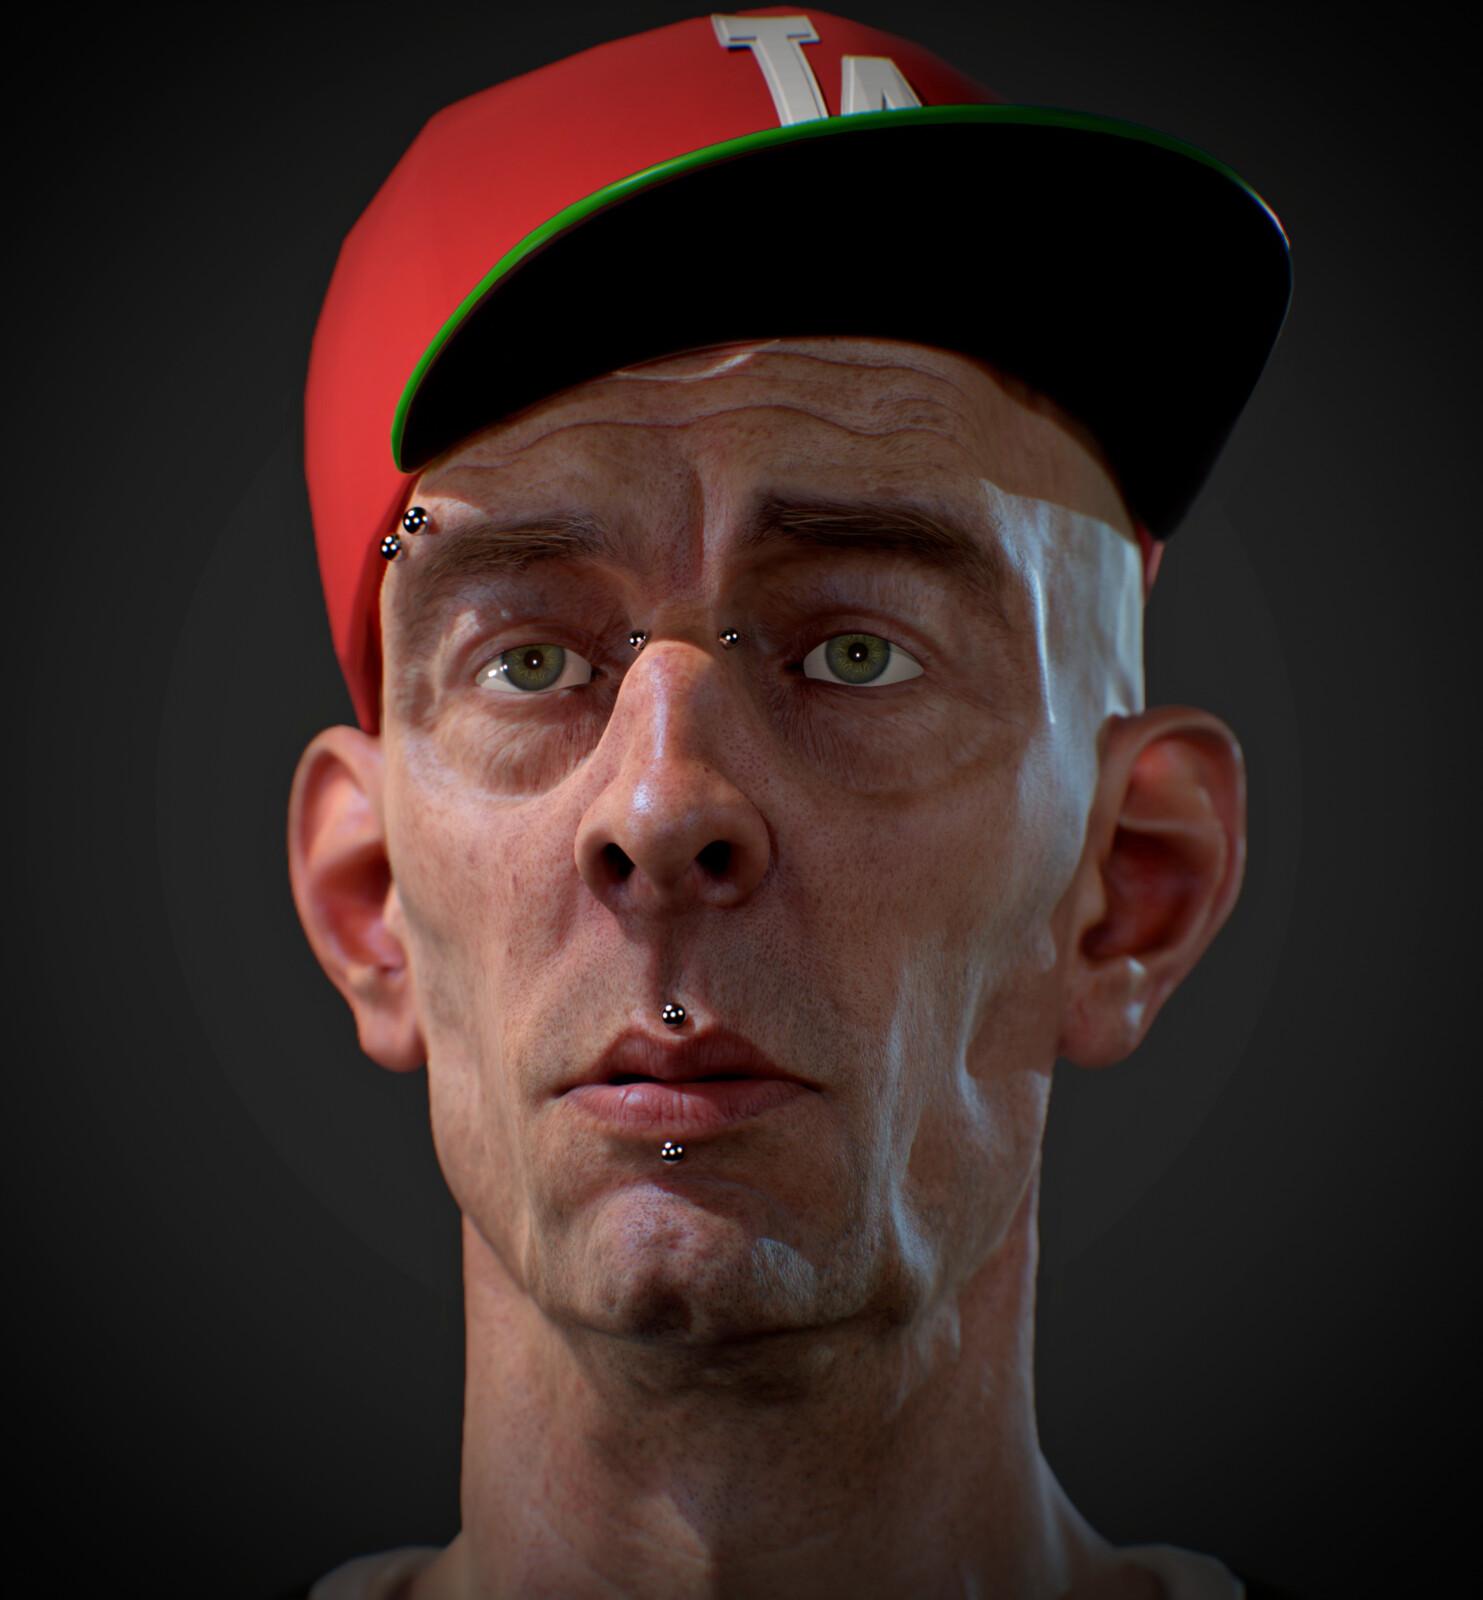 LA Dodger Fan - Marmoset Toolbag 3 renders